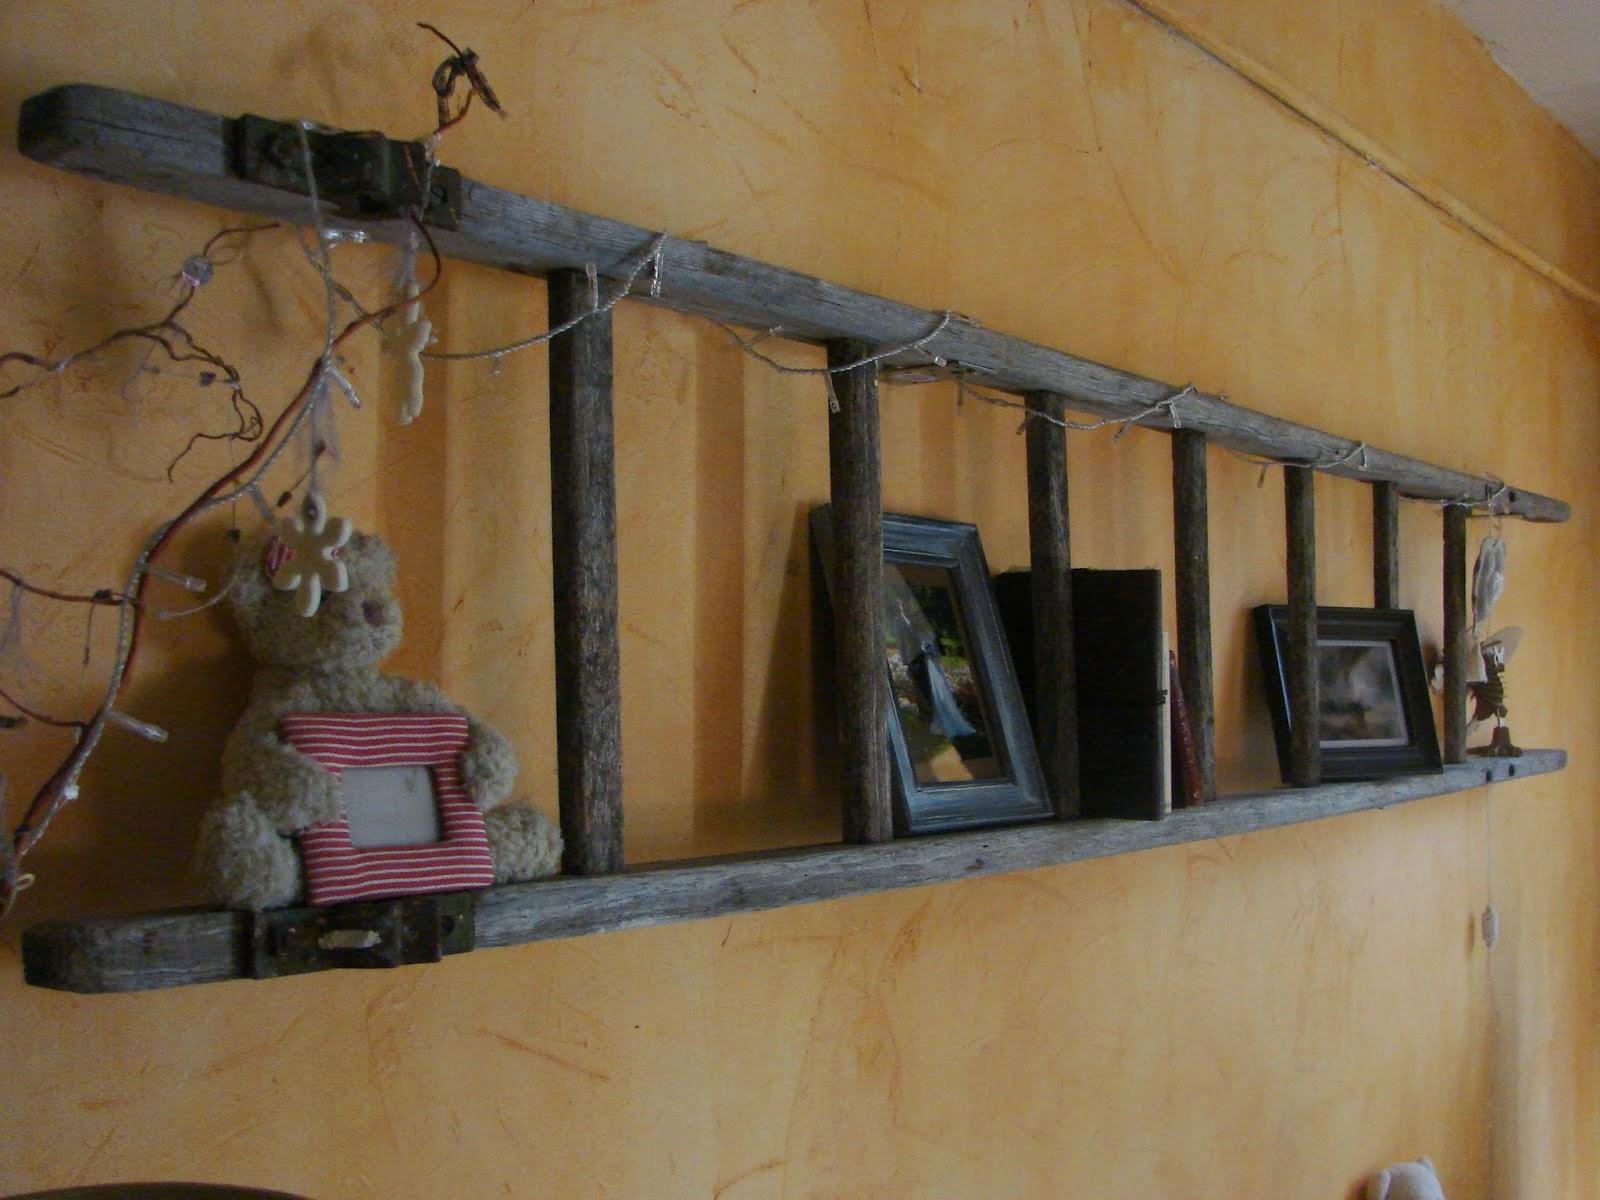 17 fa ons de recycler les vieilles chelles. Black Bedroom Furniture Sets. Home Design Ideas